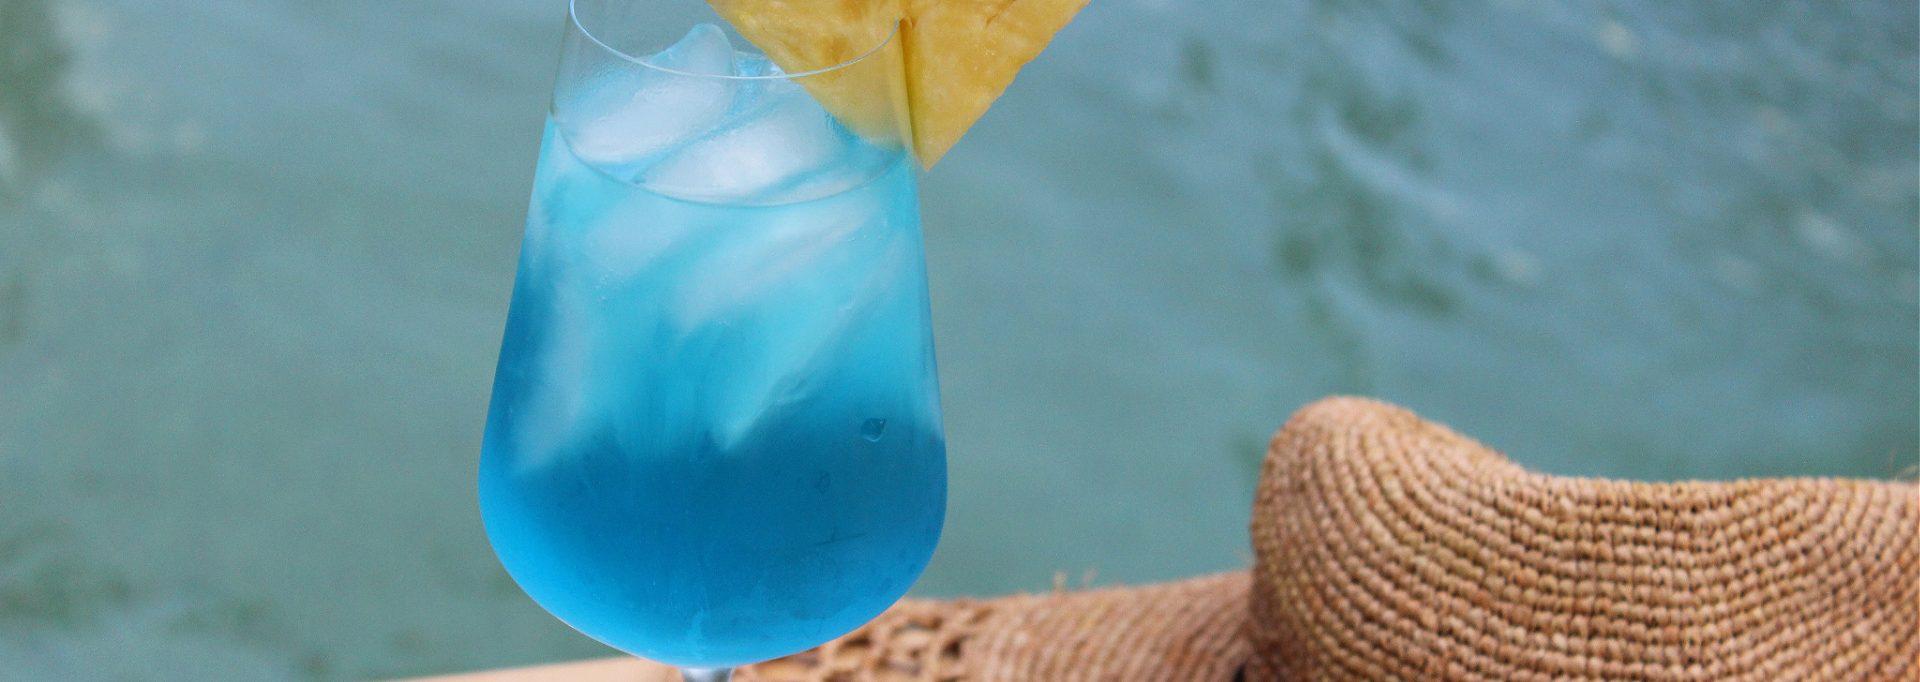 blue wine cocktail